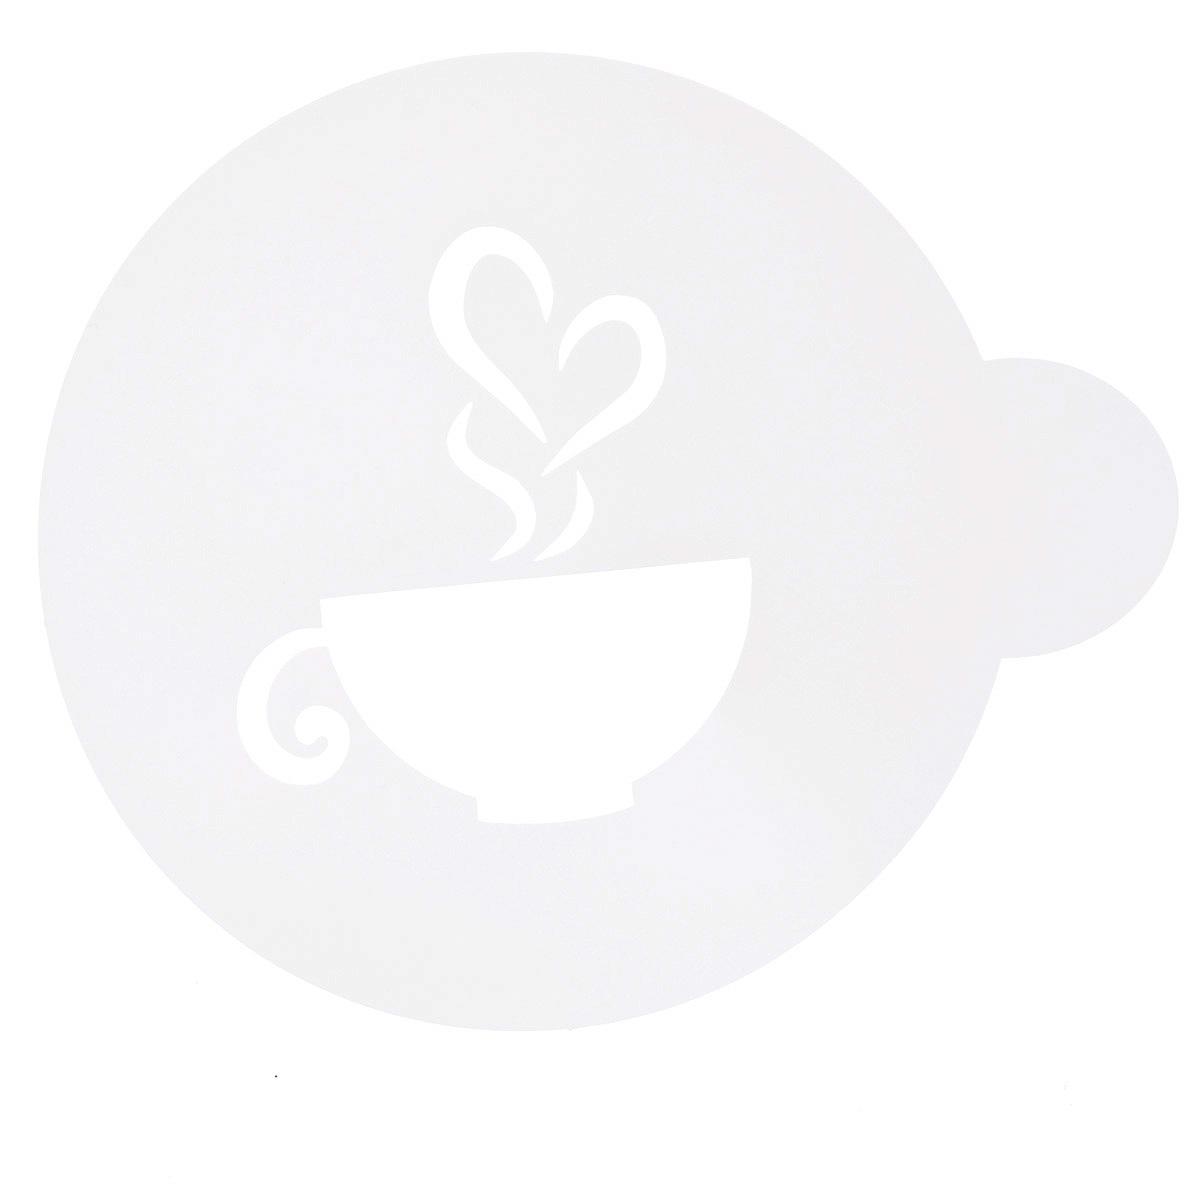 Трафарет на кофе и десерты Леденцовая фабрика